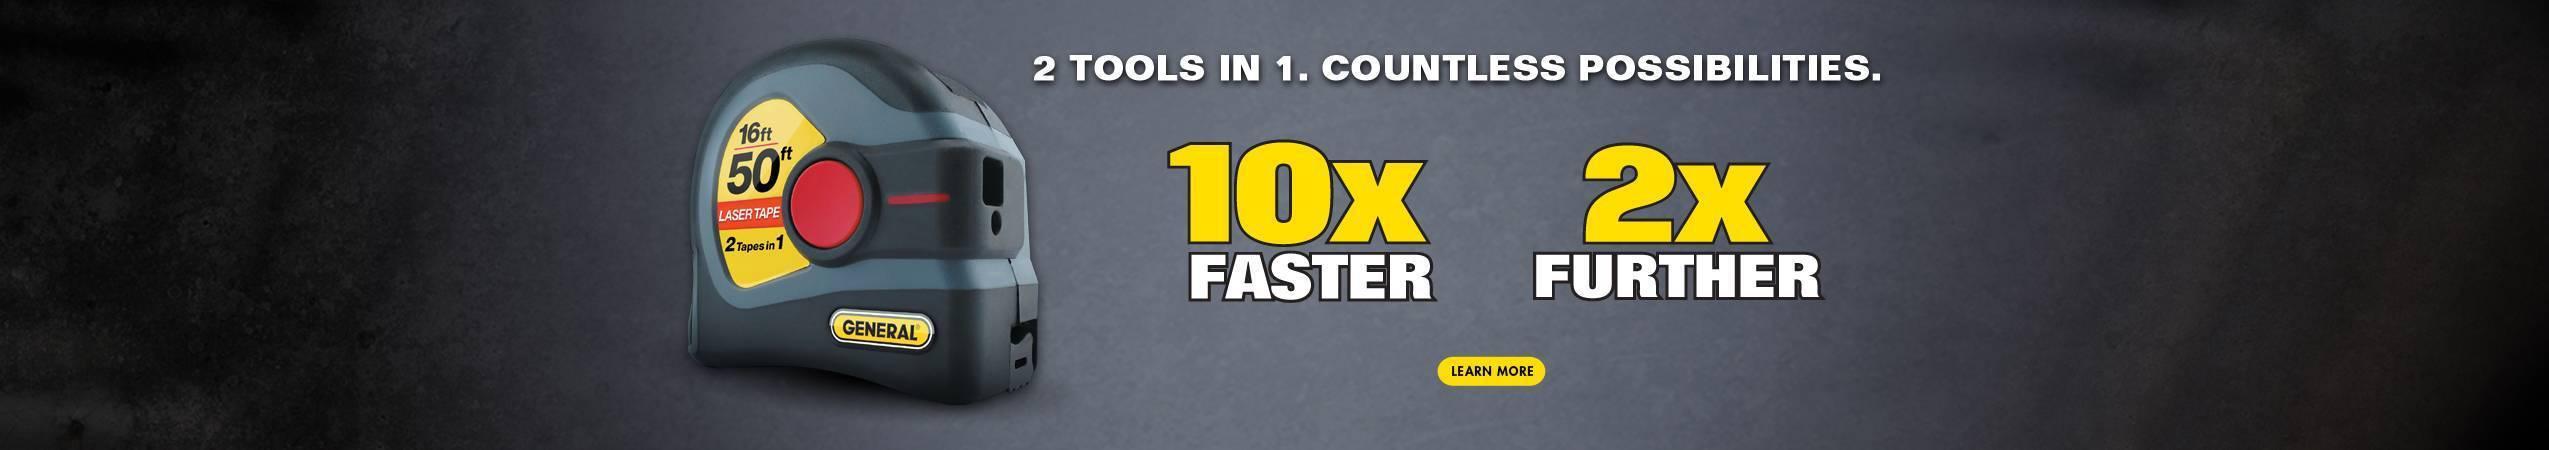 LTM1_2_Tools_In_1